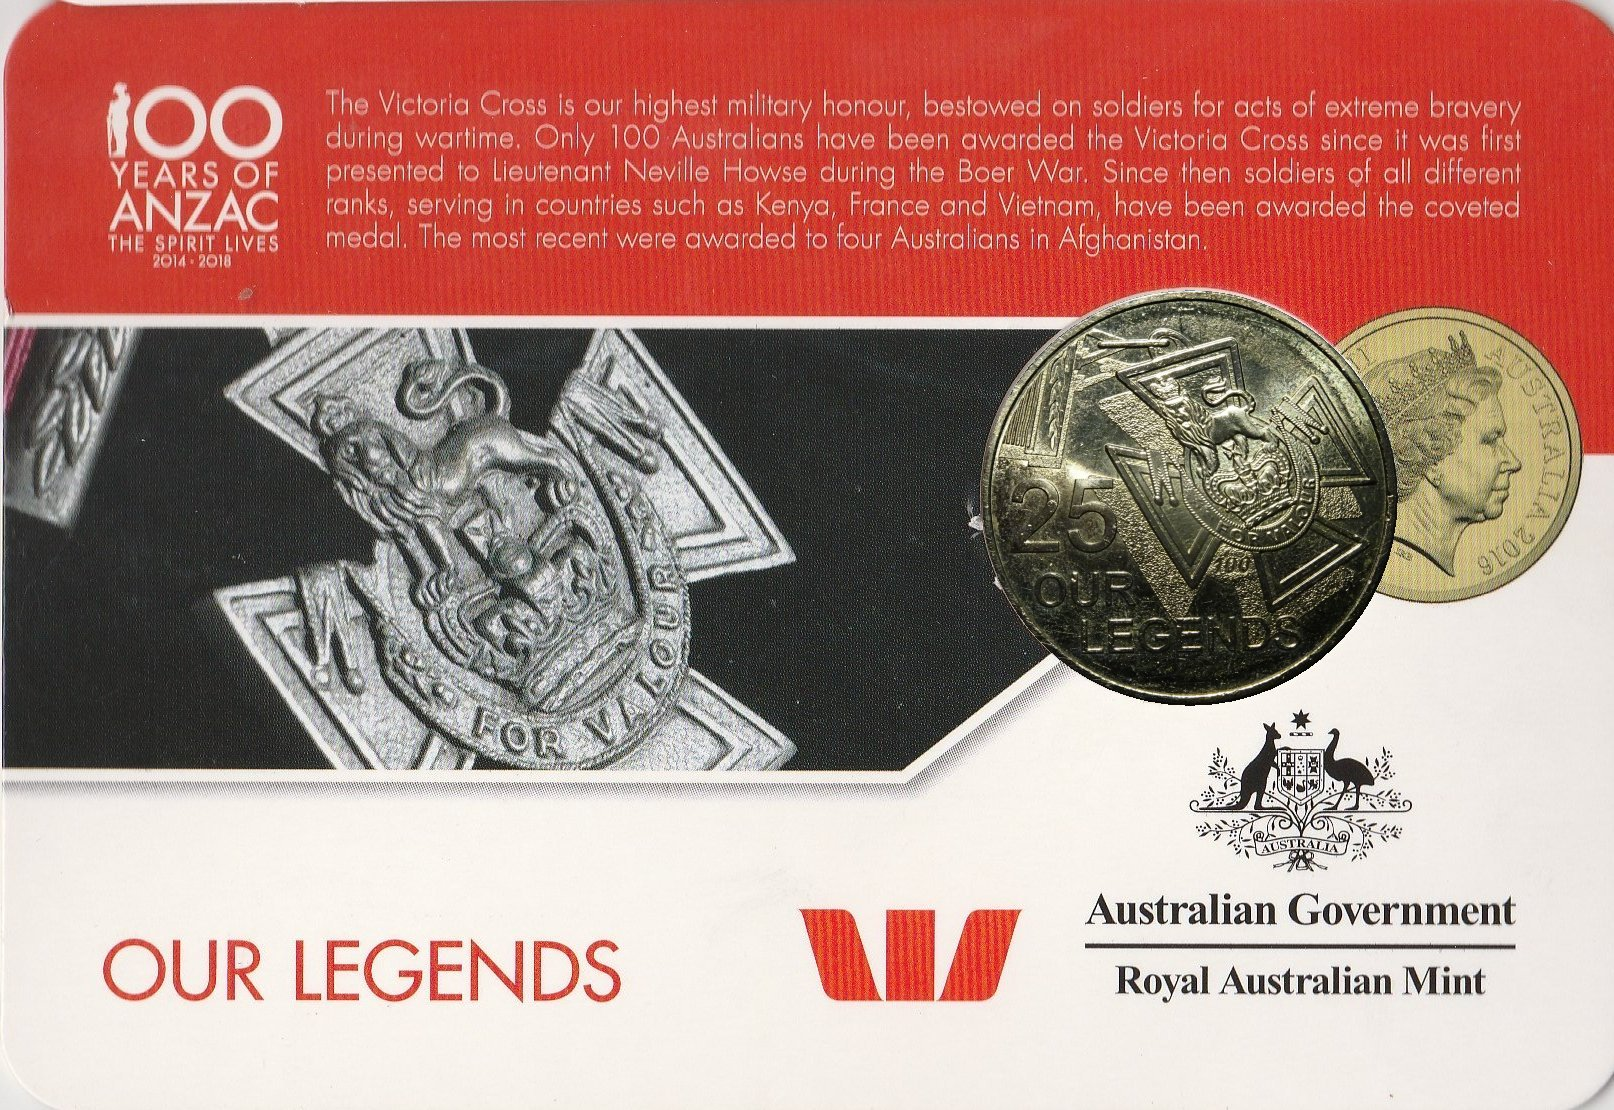 2016 25 Cent Coin BATTLE OF LONG TAN..The Spirit Lives 2014-2018 ANZAC Series.